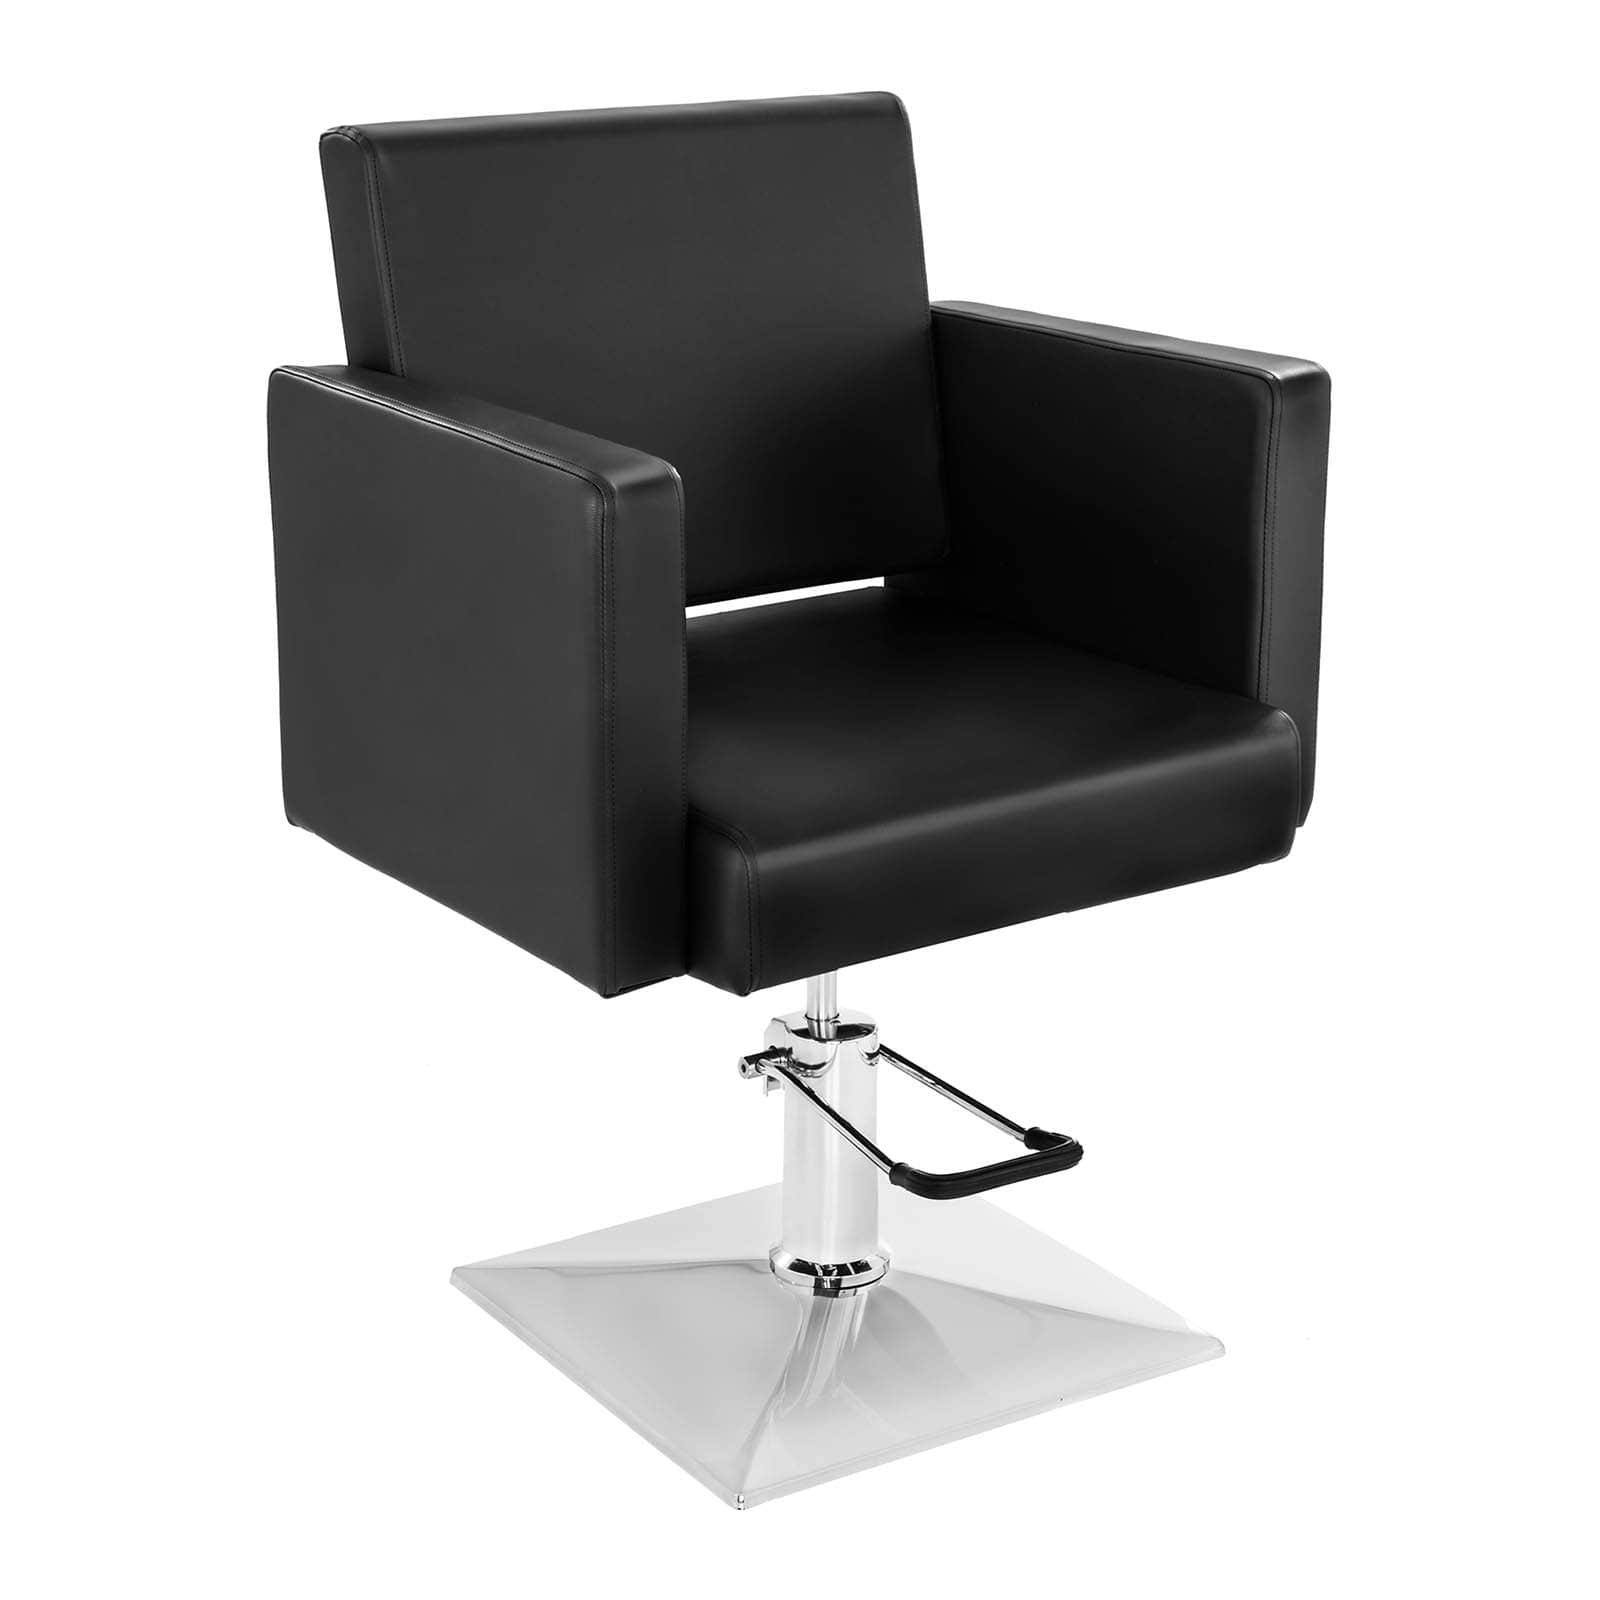 Fotel fryzjerski Bedford - czarny - 200 kg